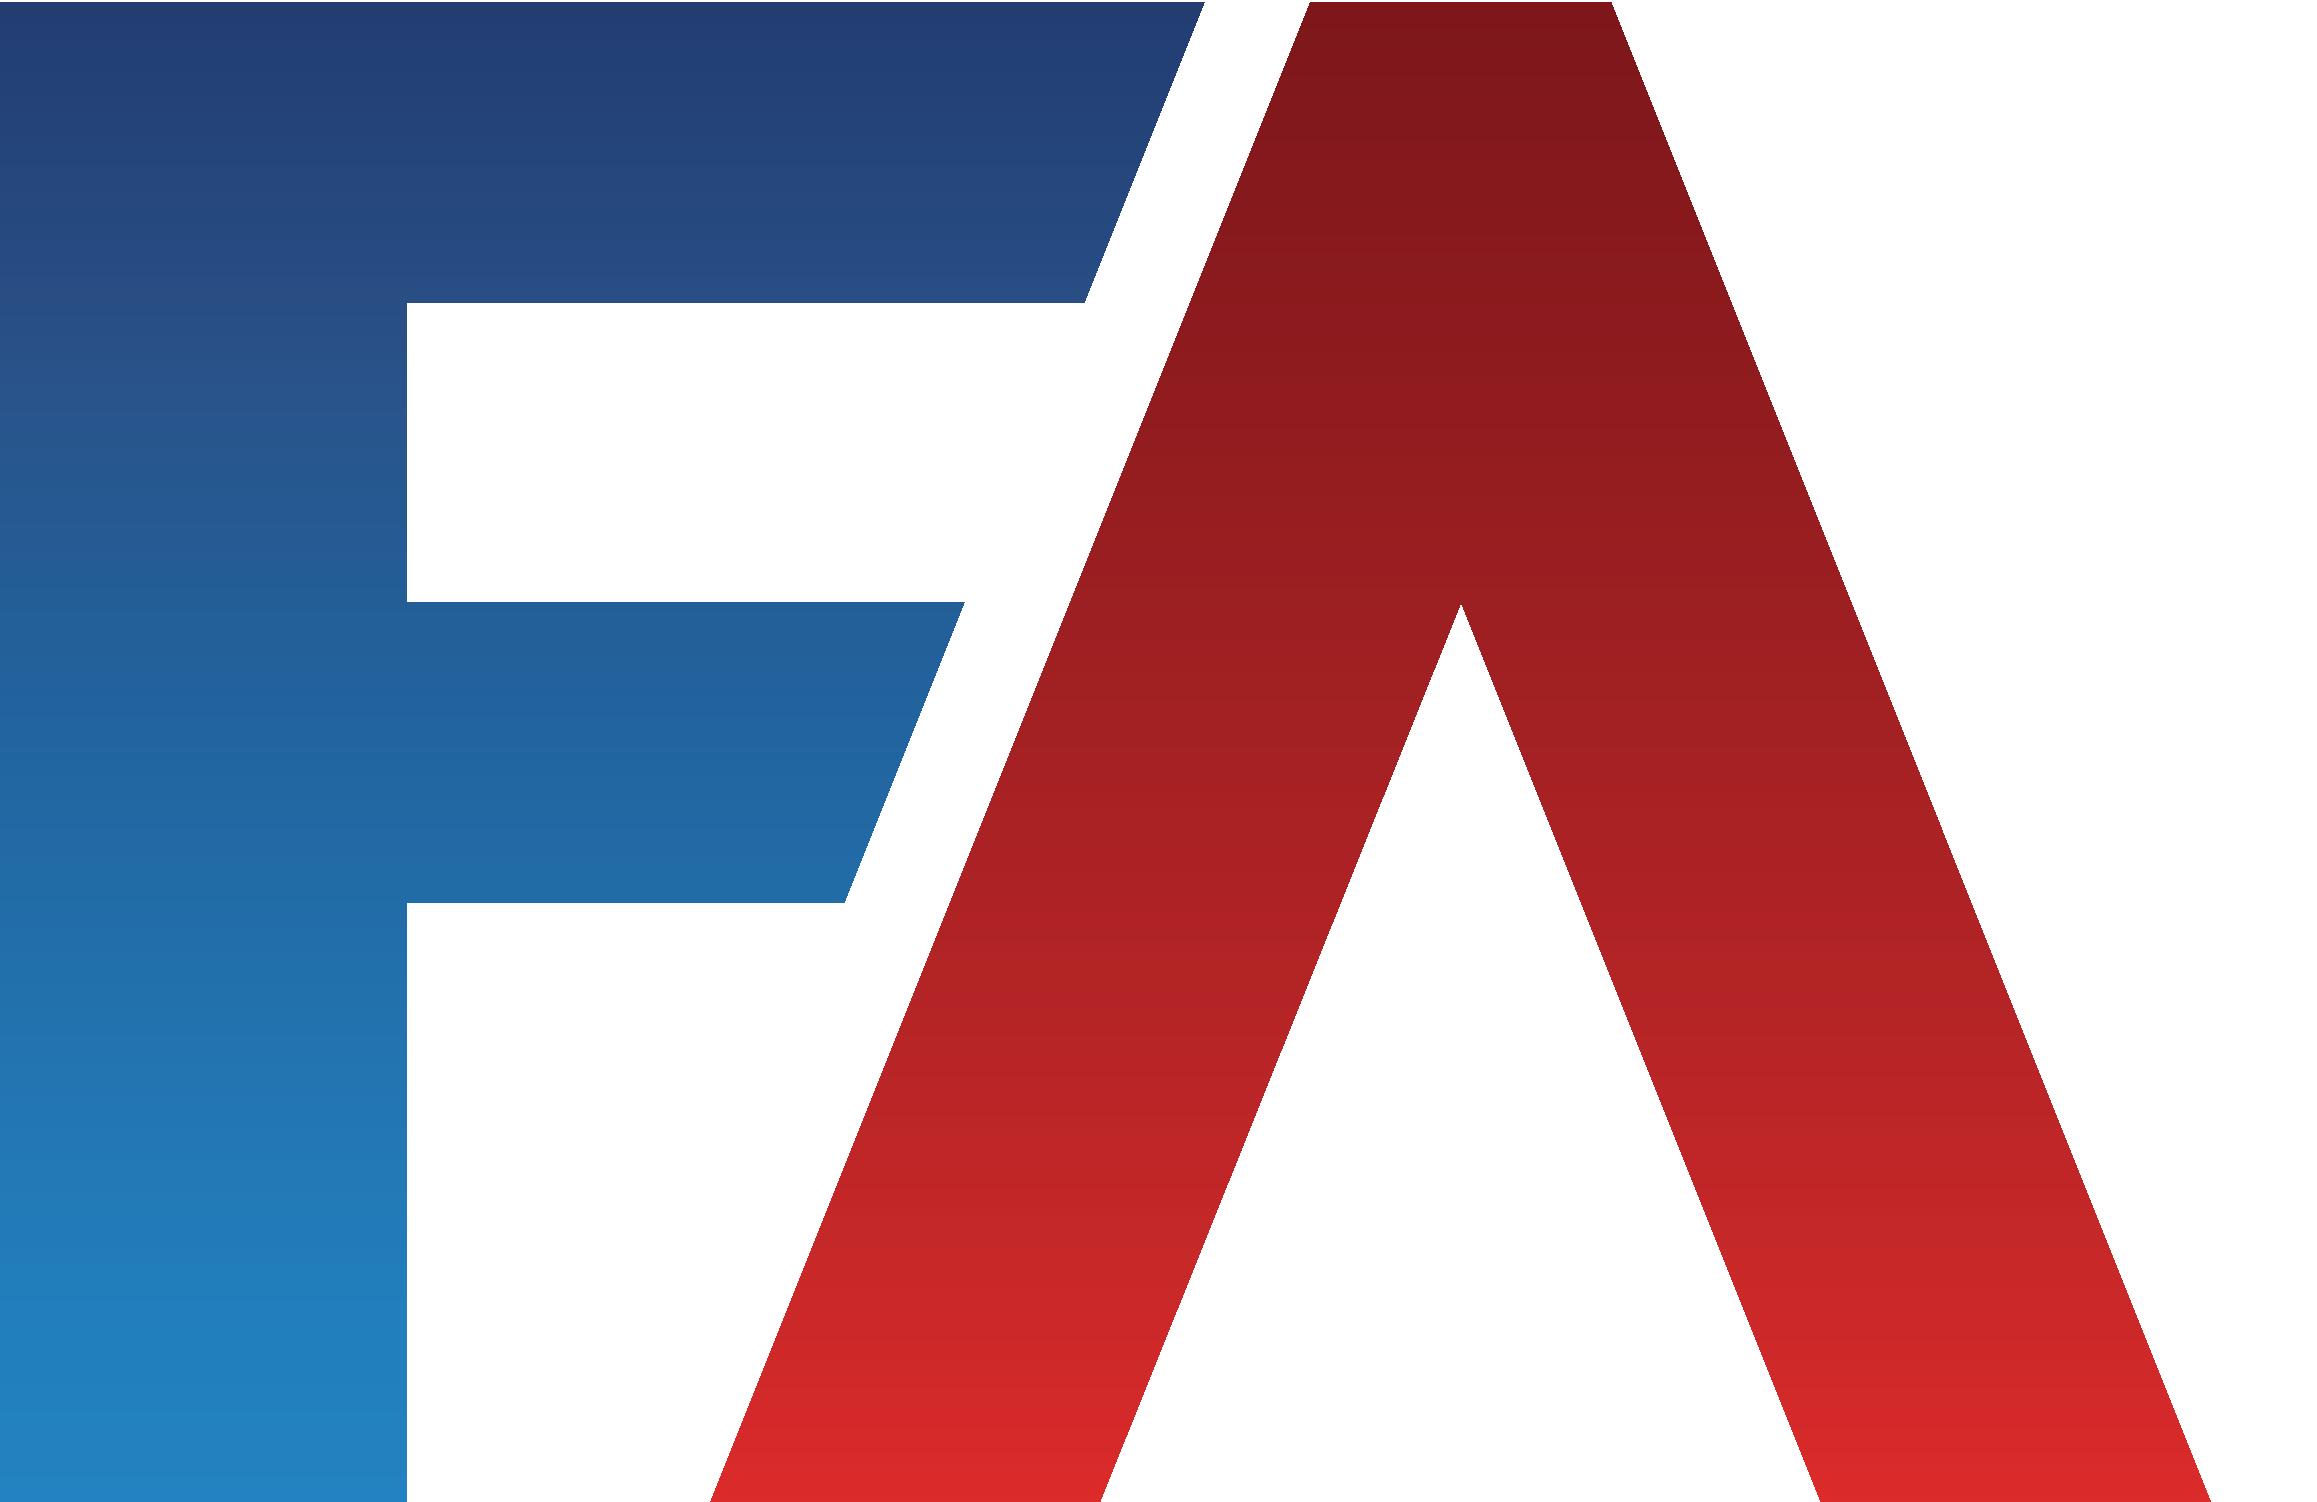 Anthony Rizzo - 1B | FantasyAlarm.com